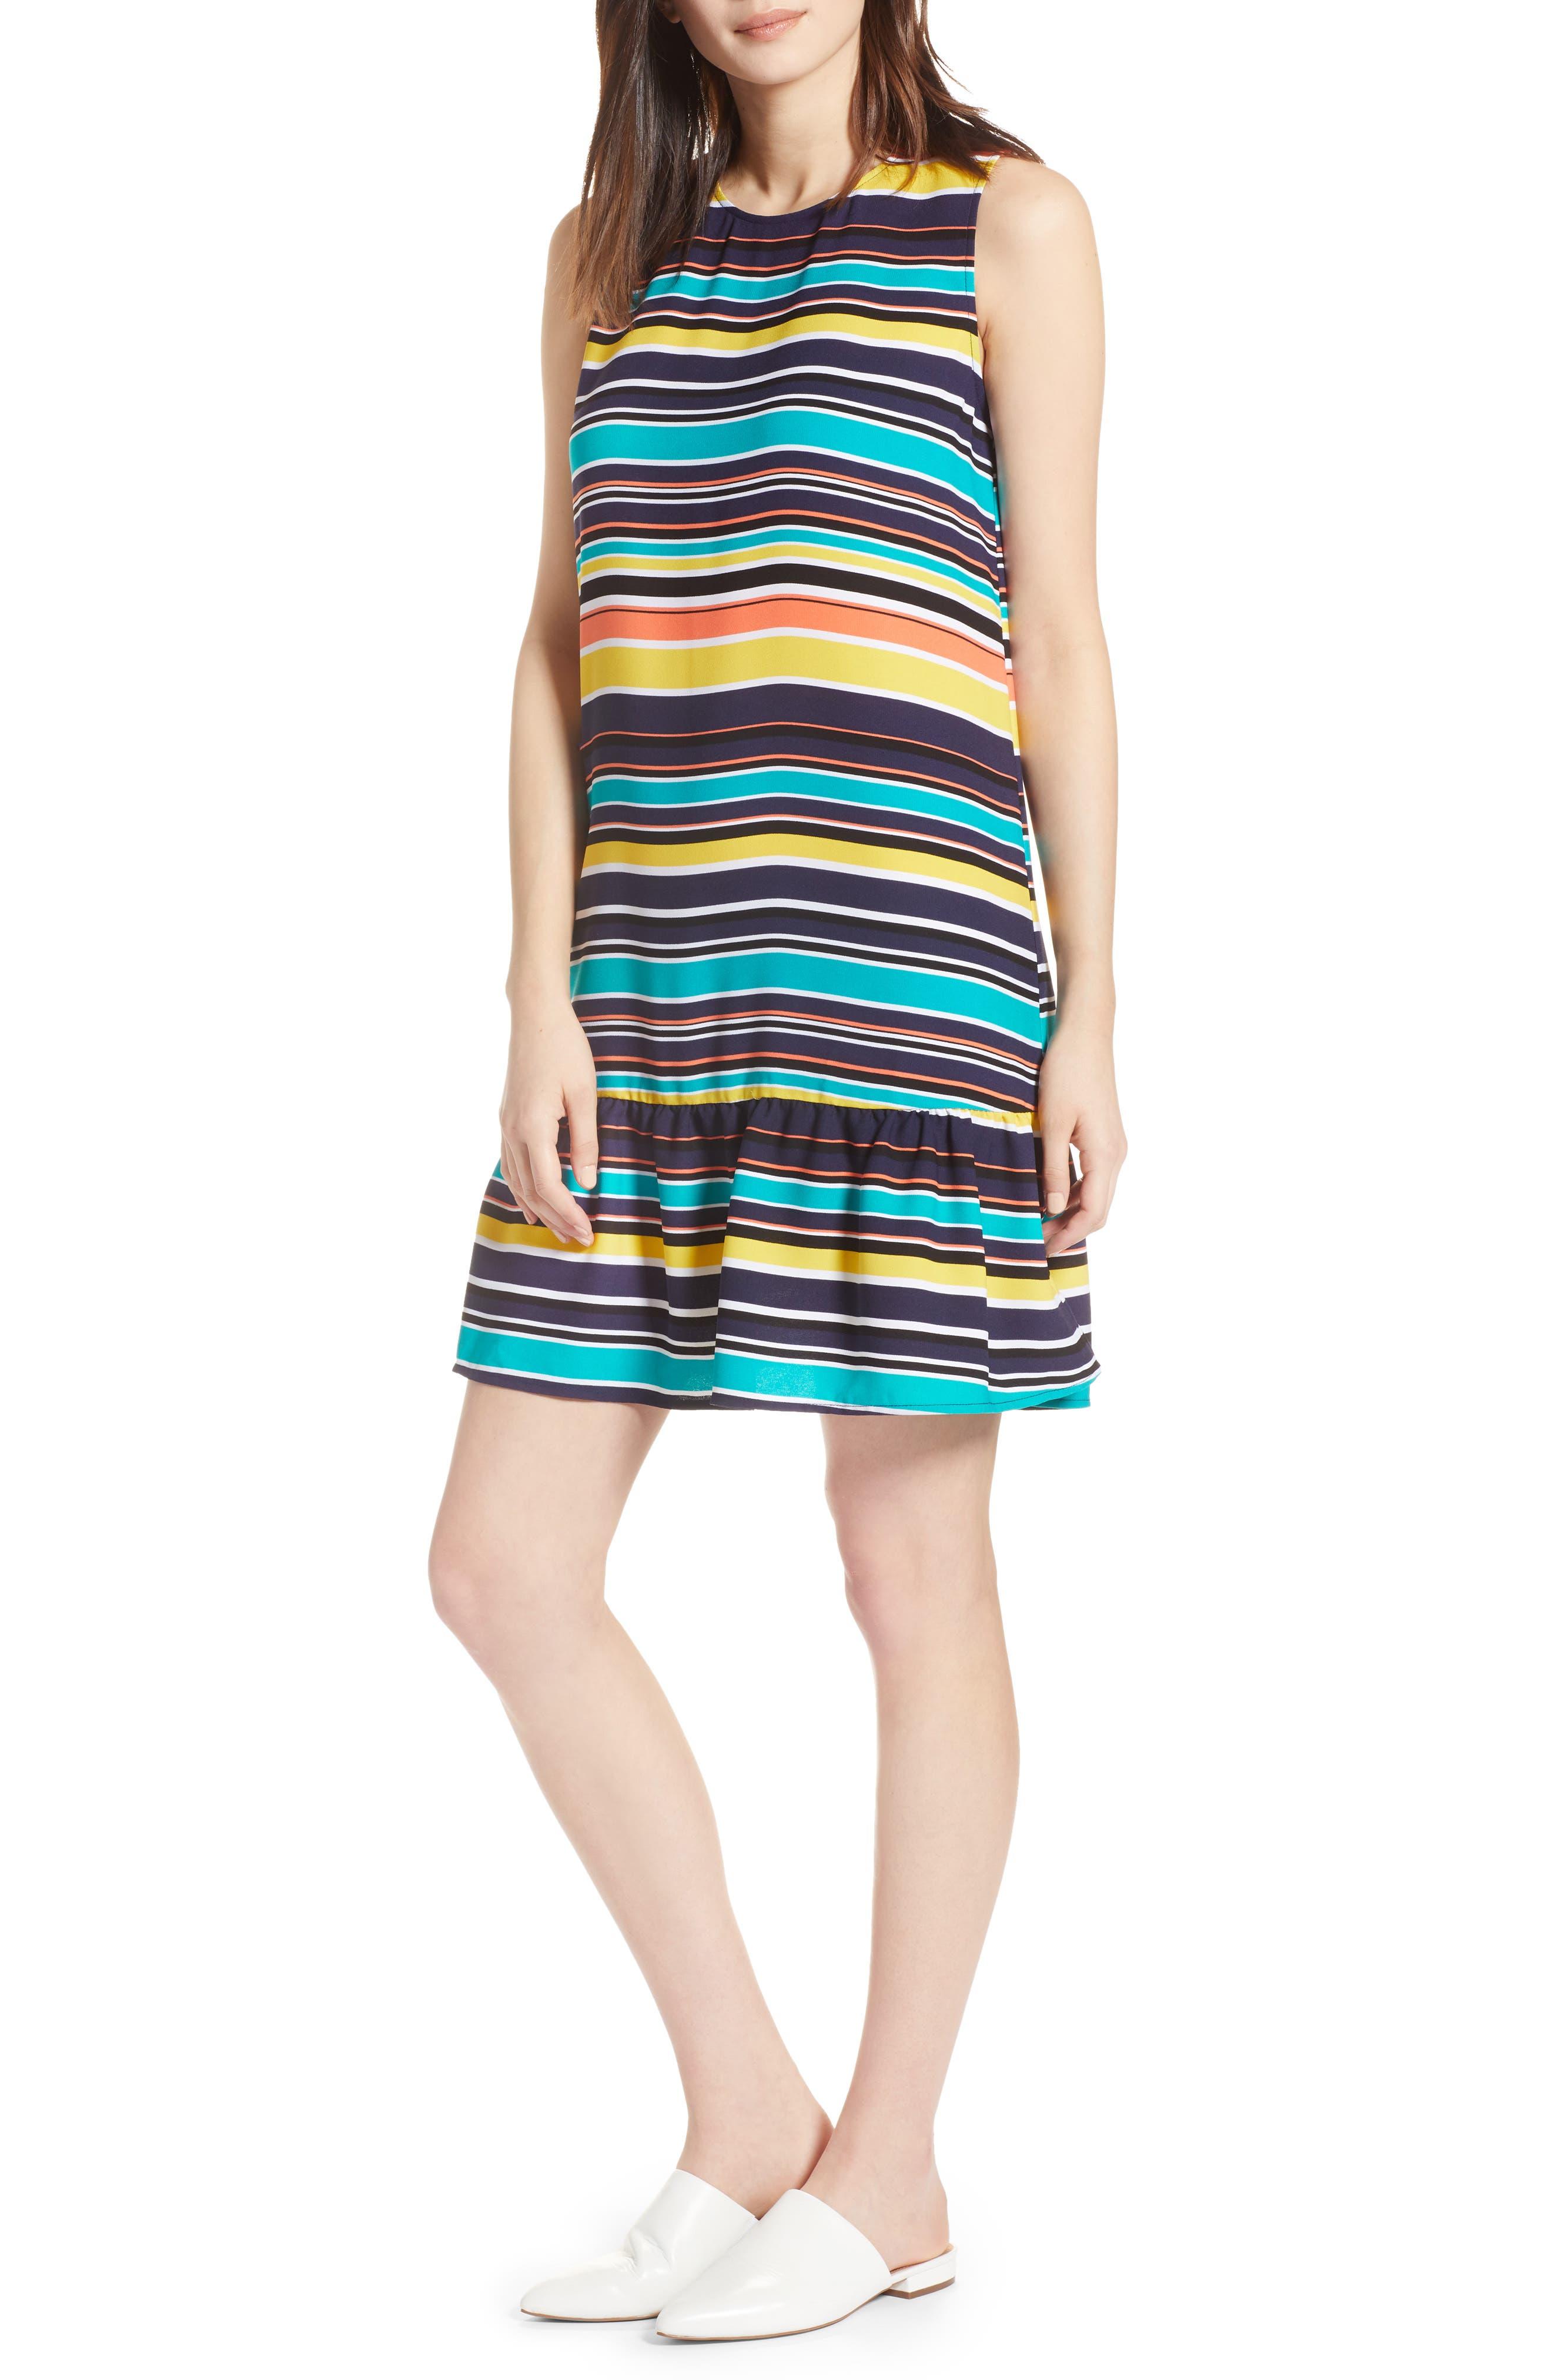 Alternate Image 1 Selected - Halogen® Ruffle Hem Shift Dress (Regular & Petite)